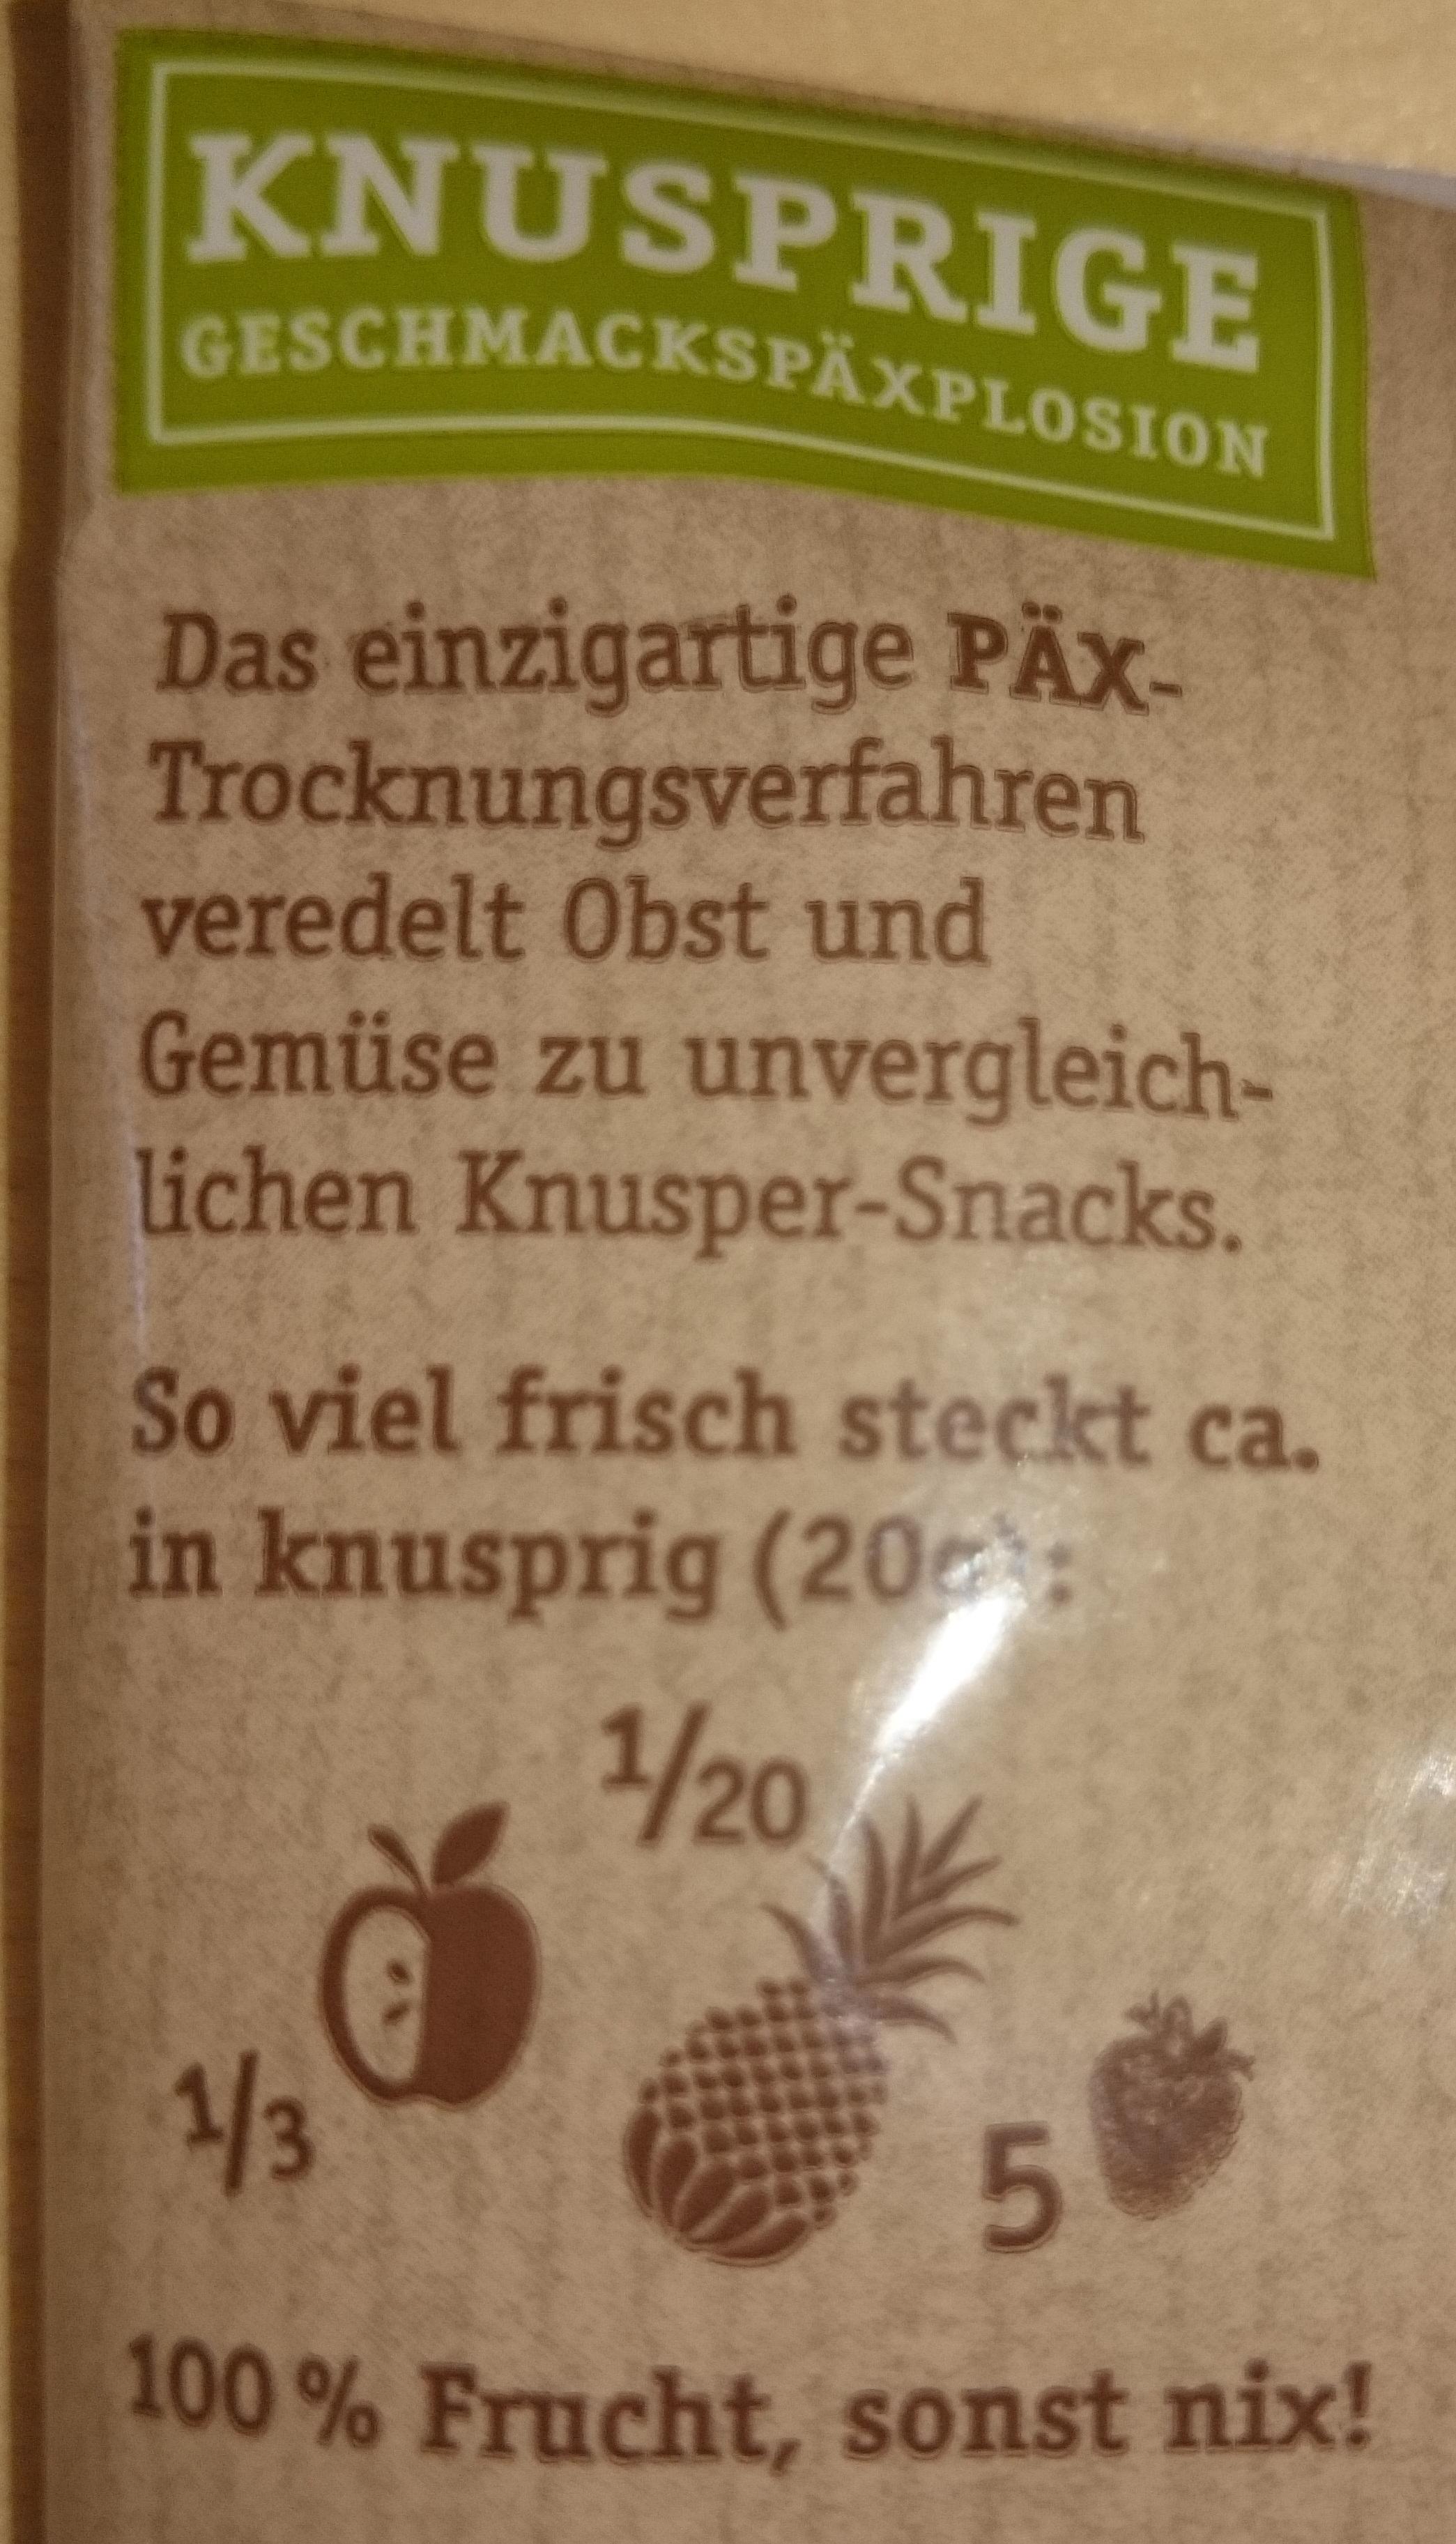 Päx Knusprige Früchte